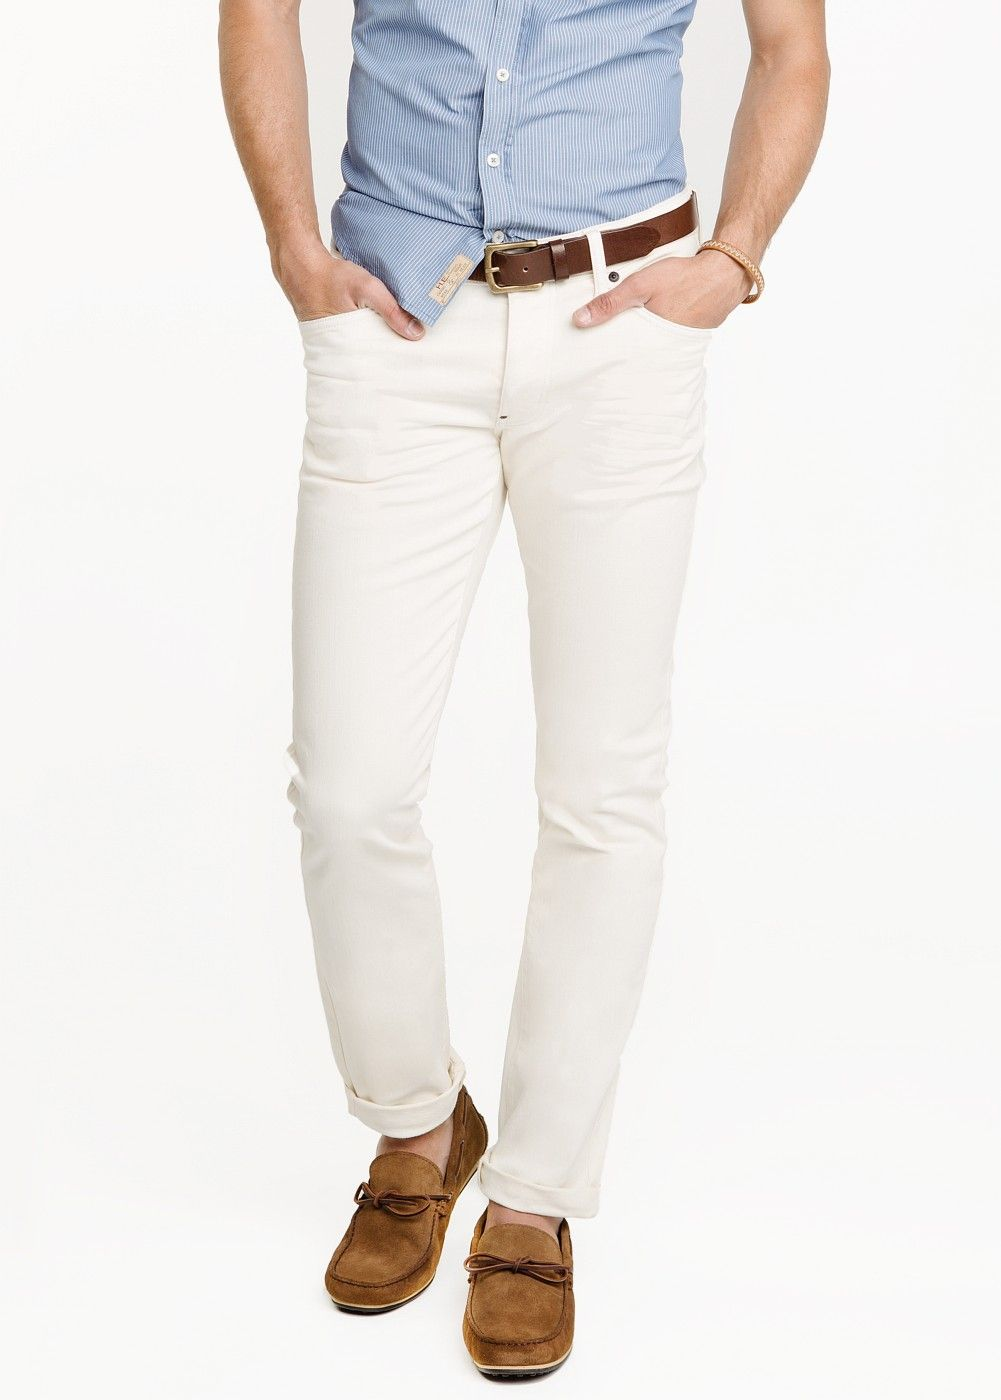 Jeans tim slim-fit crudos - Hombre  6fee4715c0b4